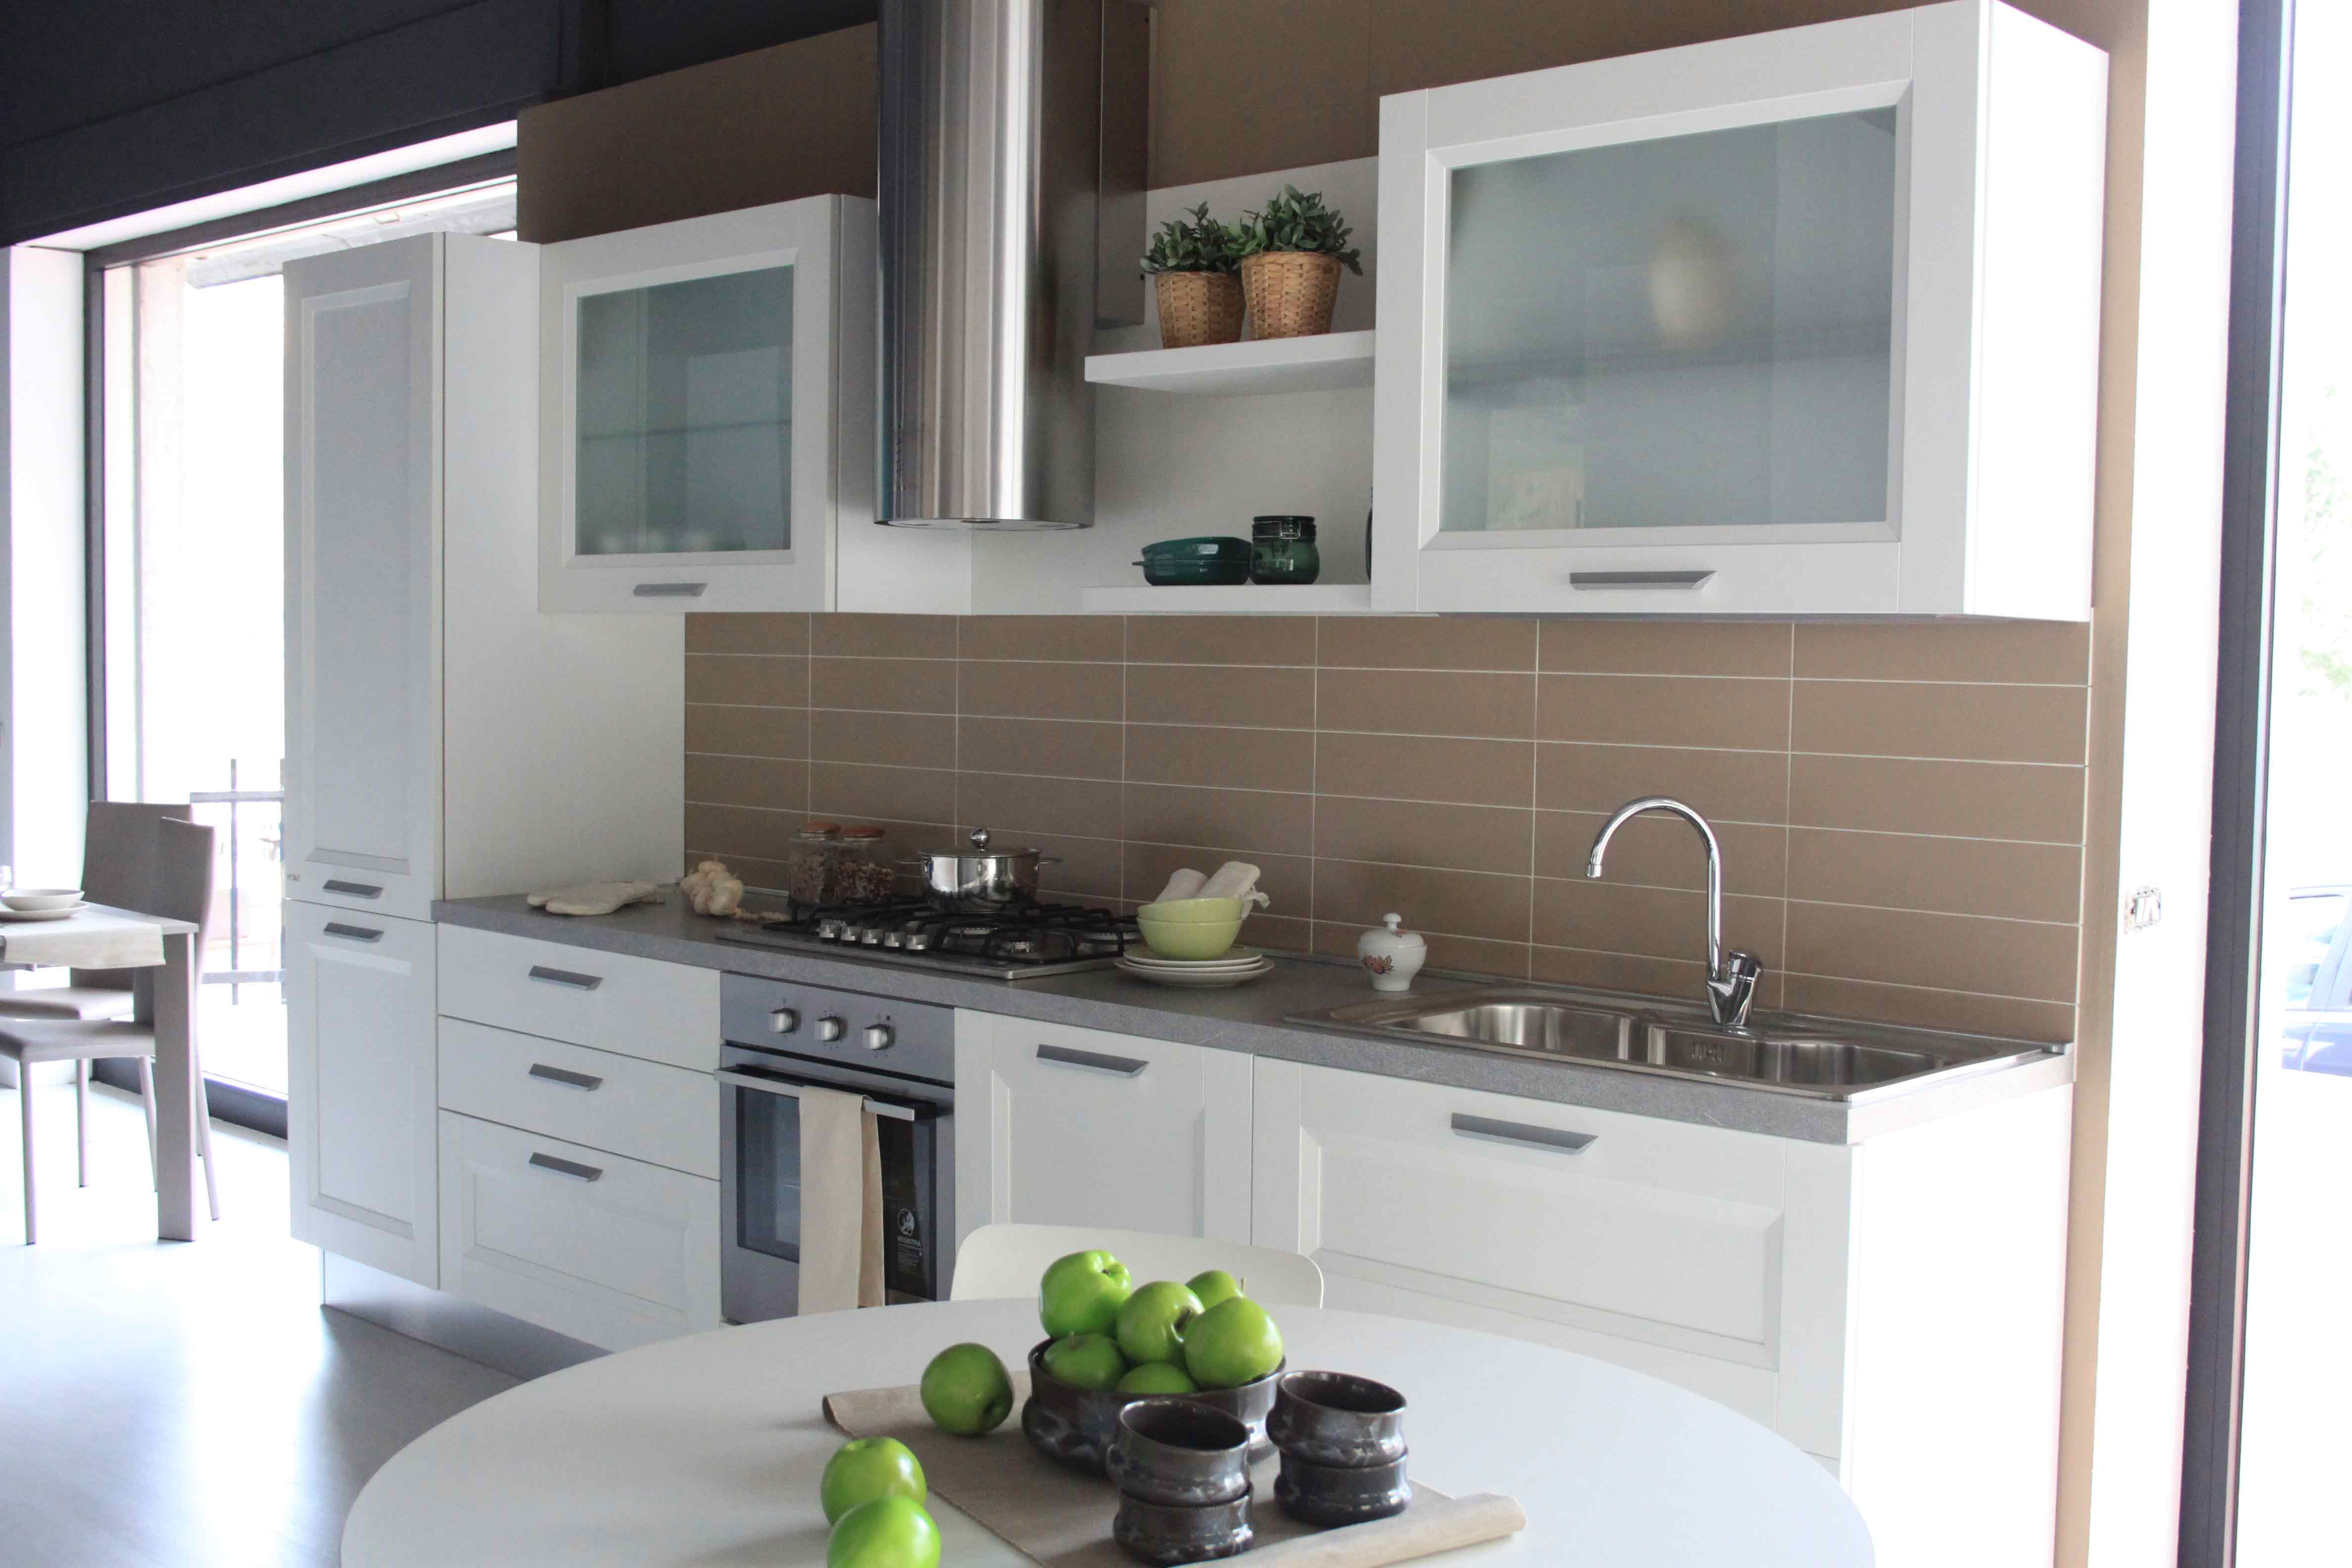 Cucina Mod. Dream - Febal casa - Leonetti Design